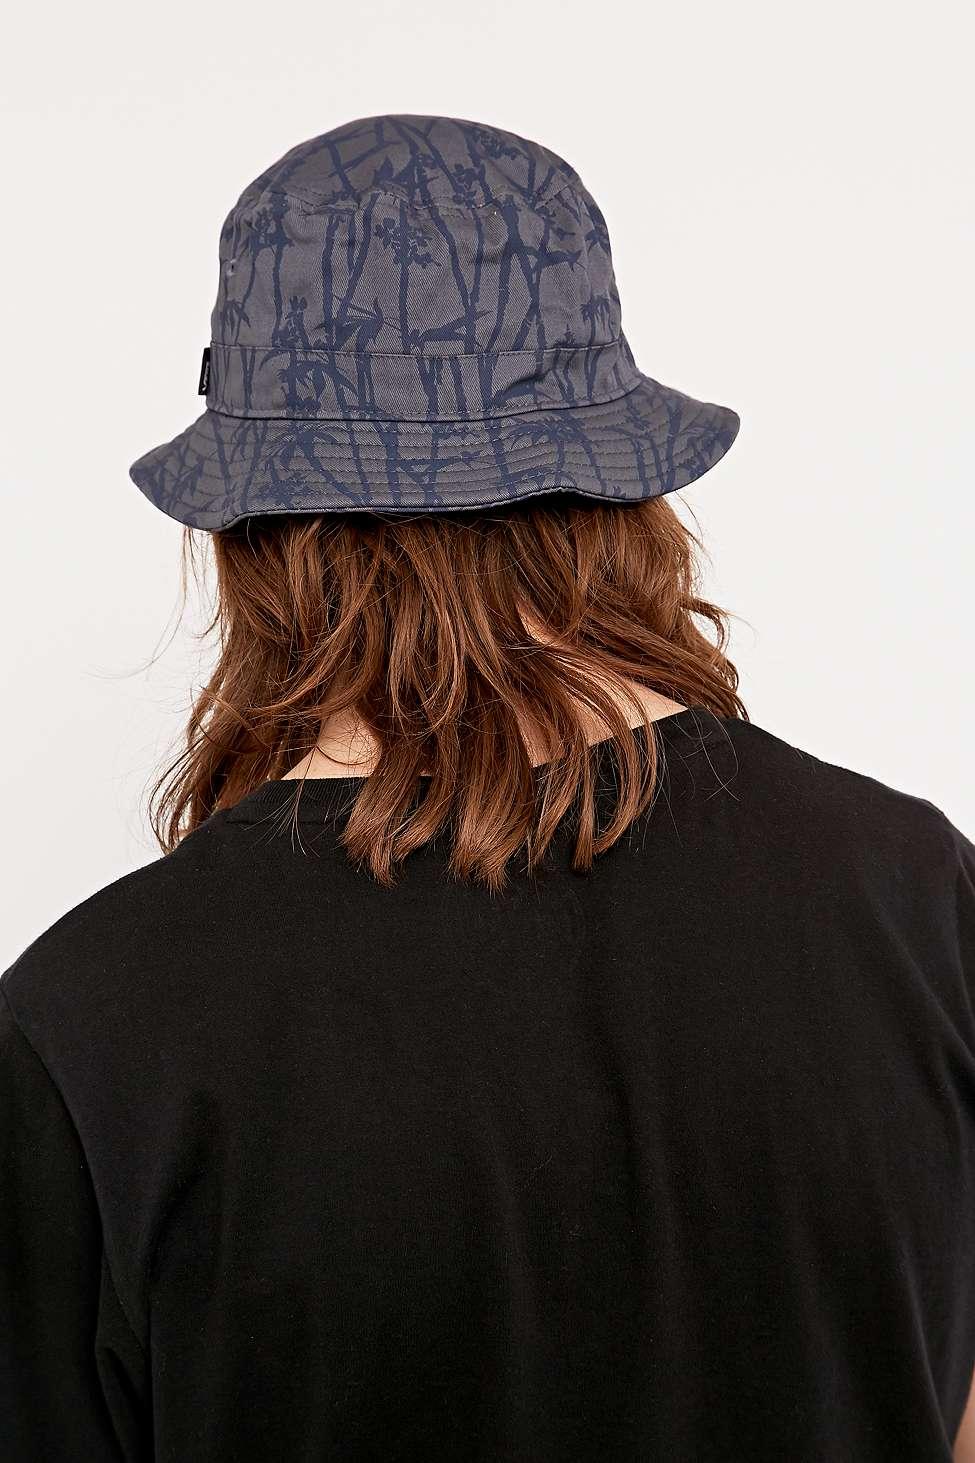 Vans Undertone Bucket Hat In Blue in Blue for Men - Lyst c76dbc5a7b45